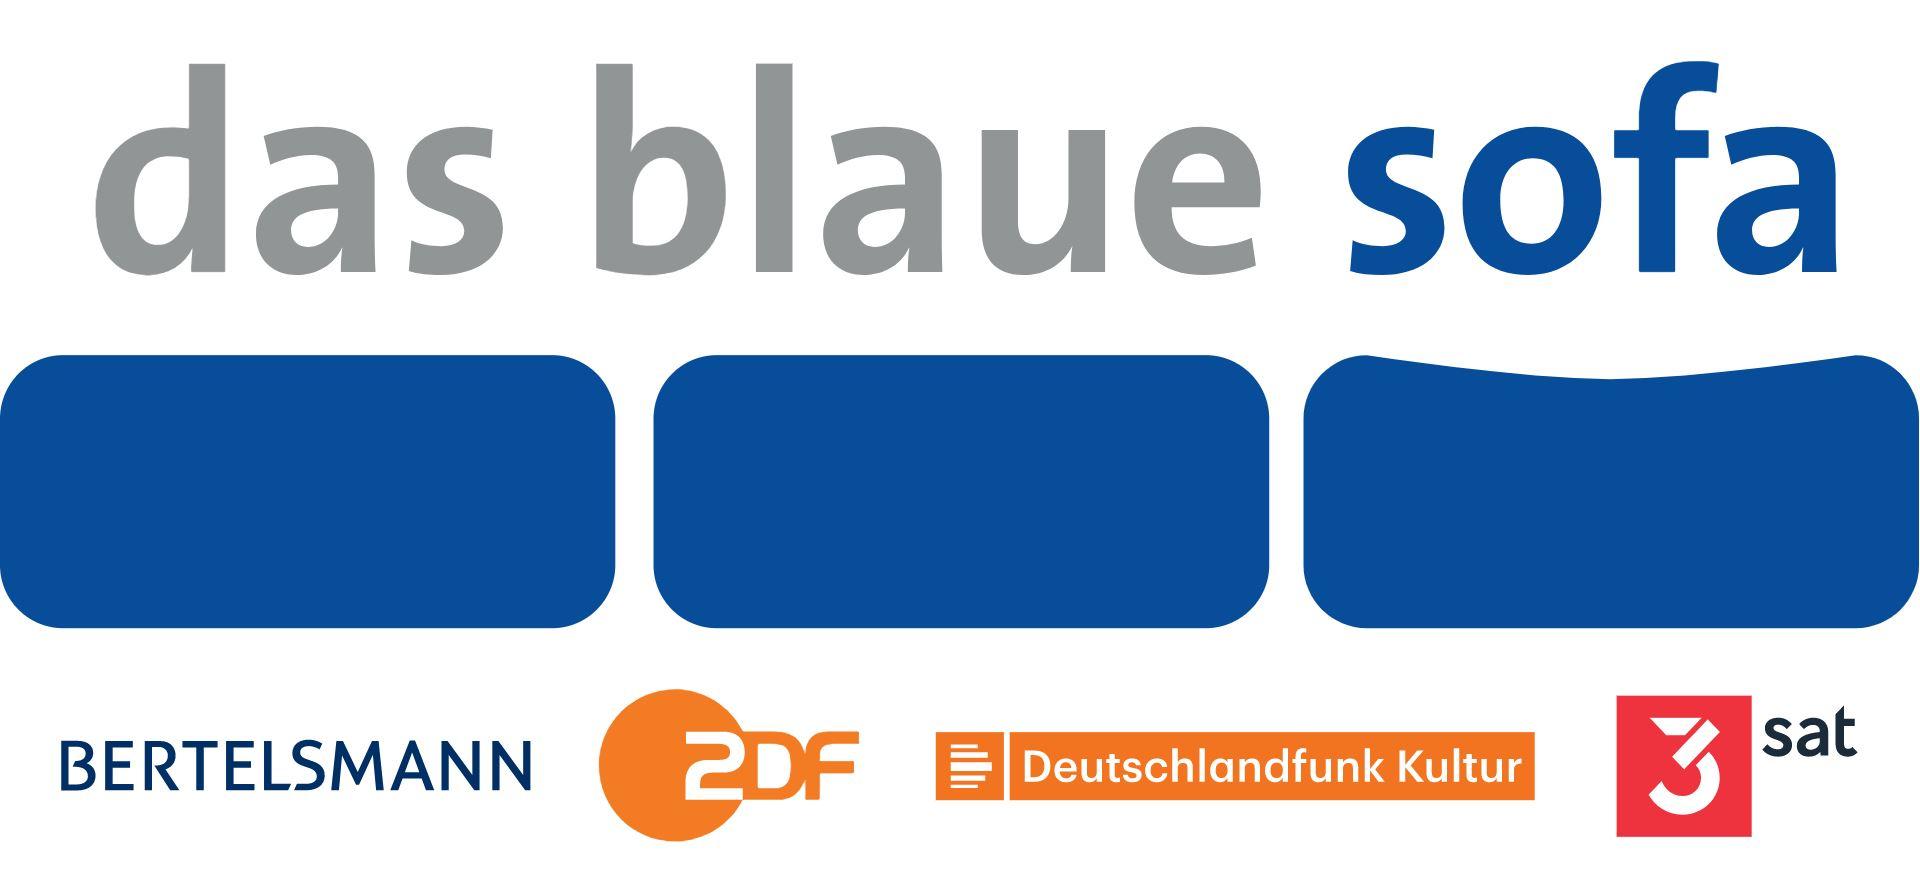 Das Blaue Sofa digital zur Frankfurter Buchmesse 2020